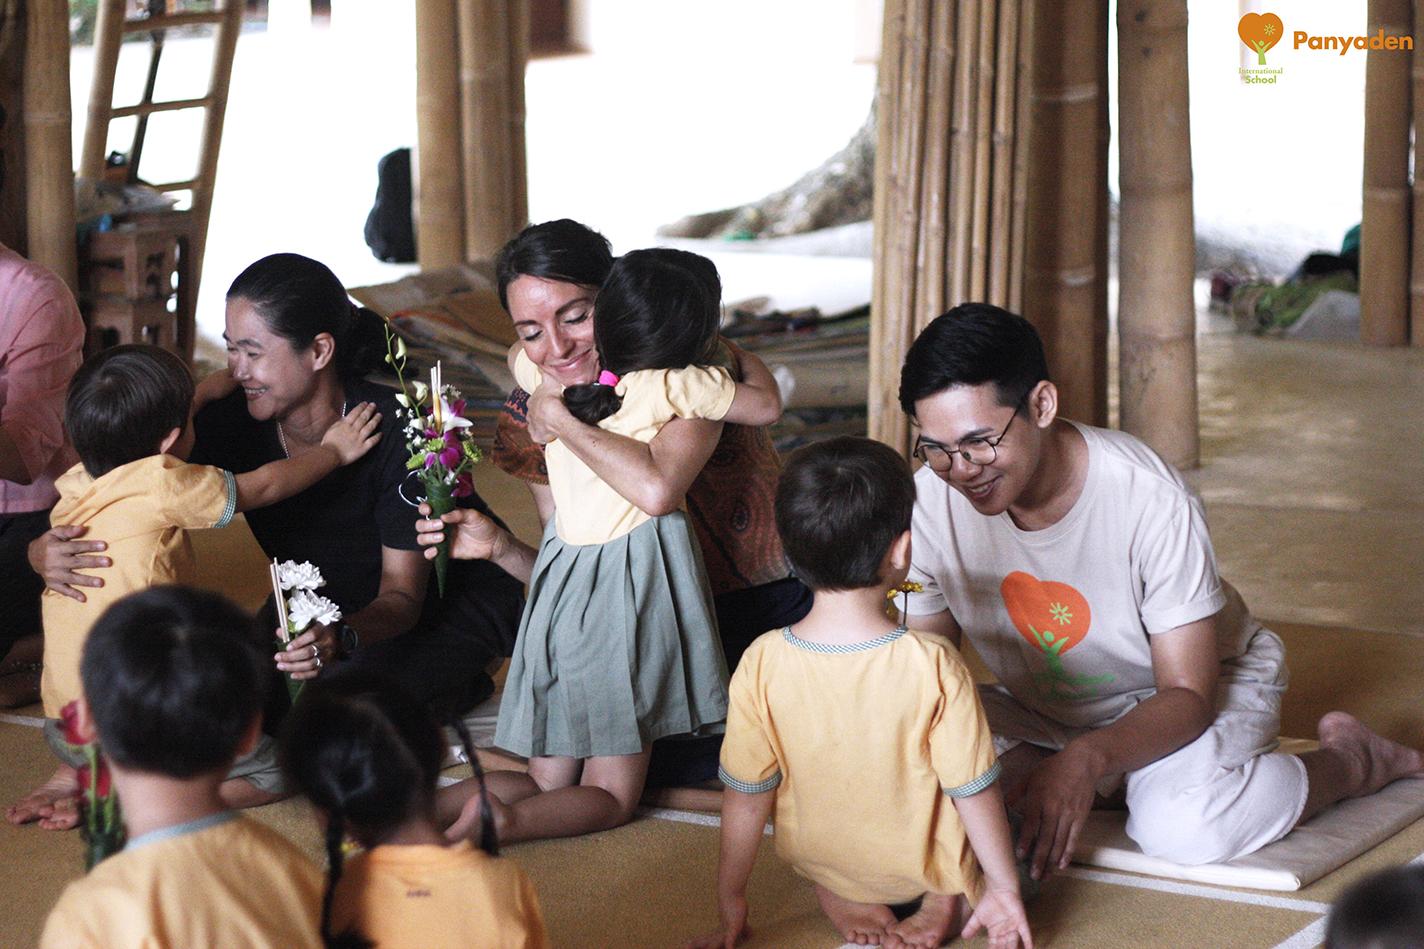 Panyaden Wai Kru Day 2017 ceremony - hugs and flowers for teachers